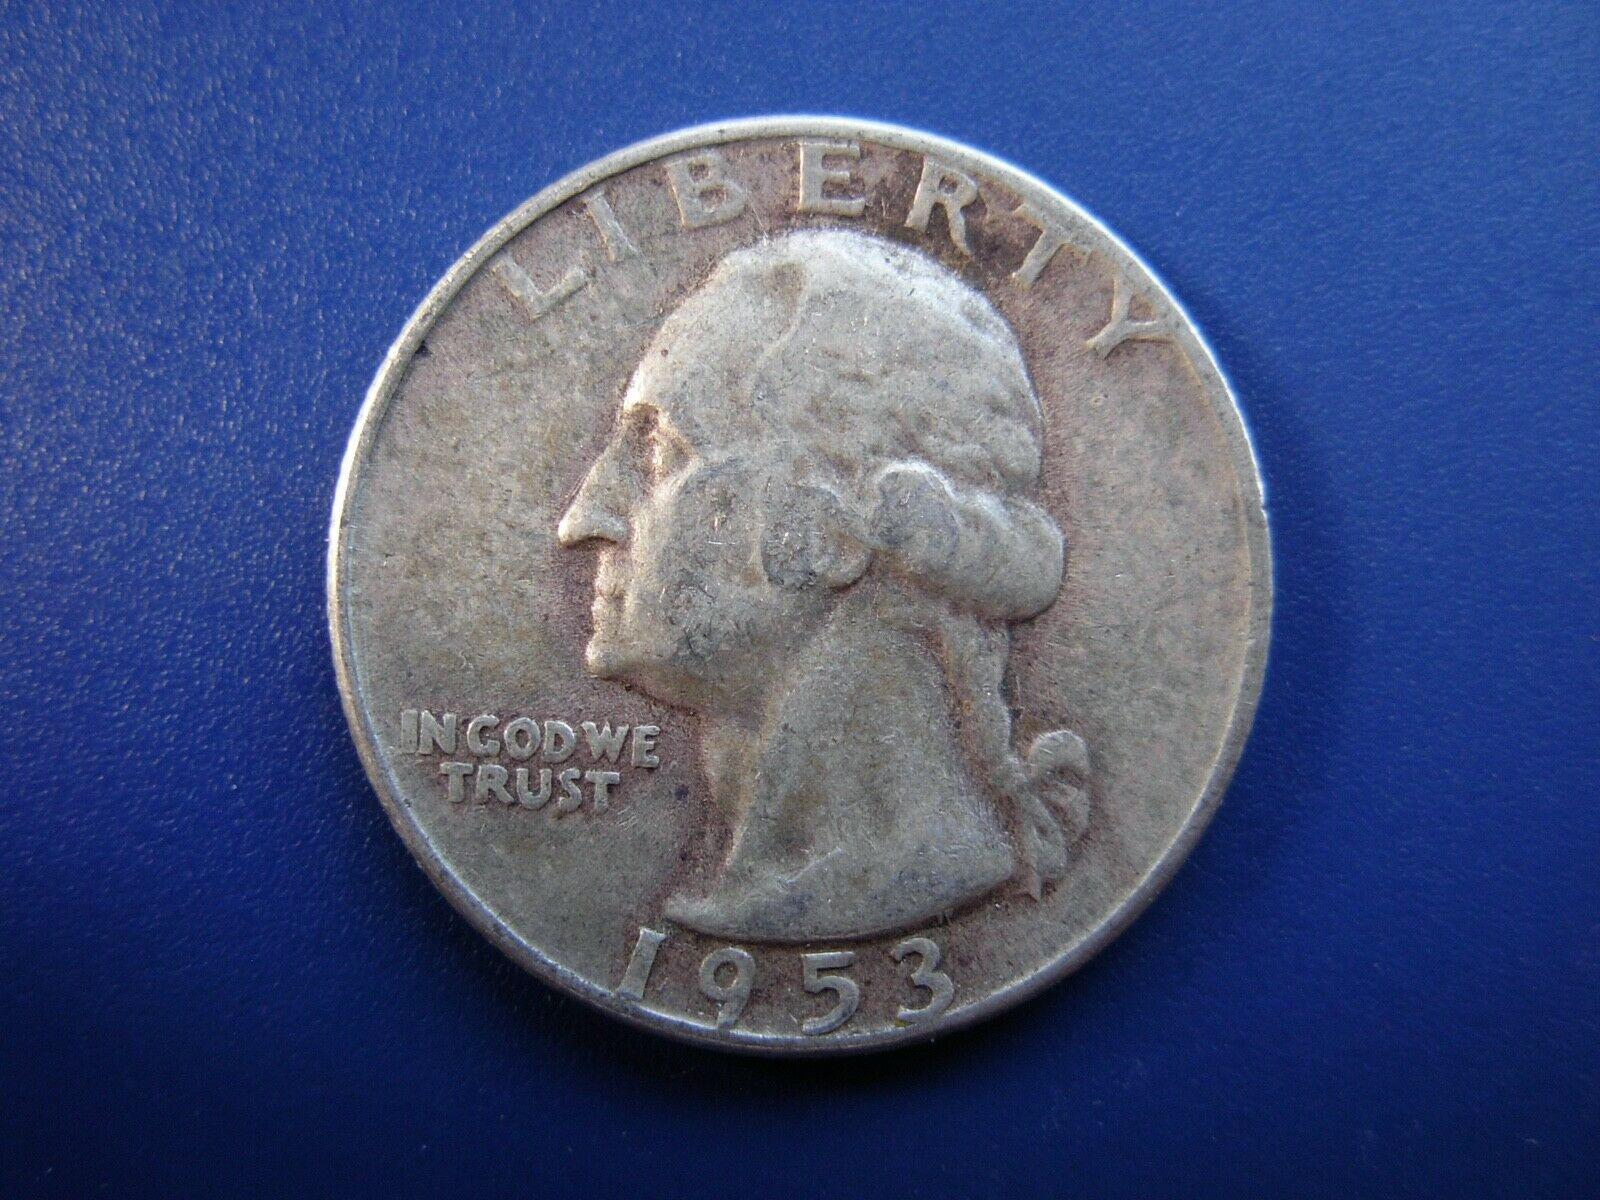 Very Nice Original 1953-S VF Washington Quarter. 2 - $7.35